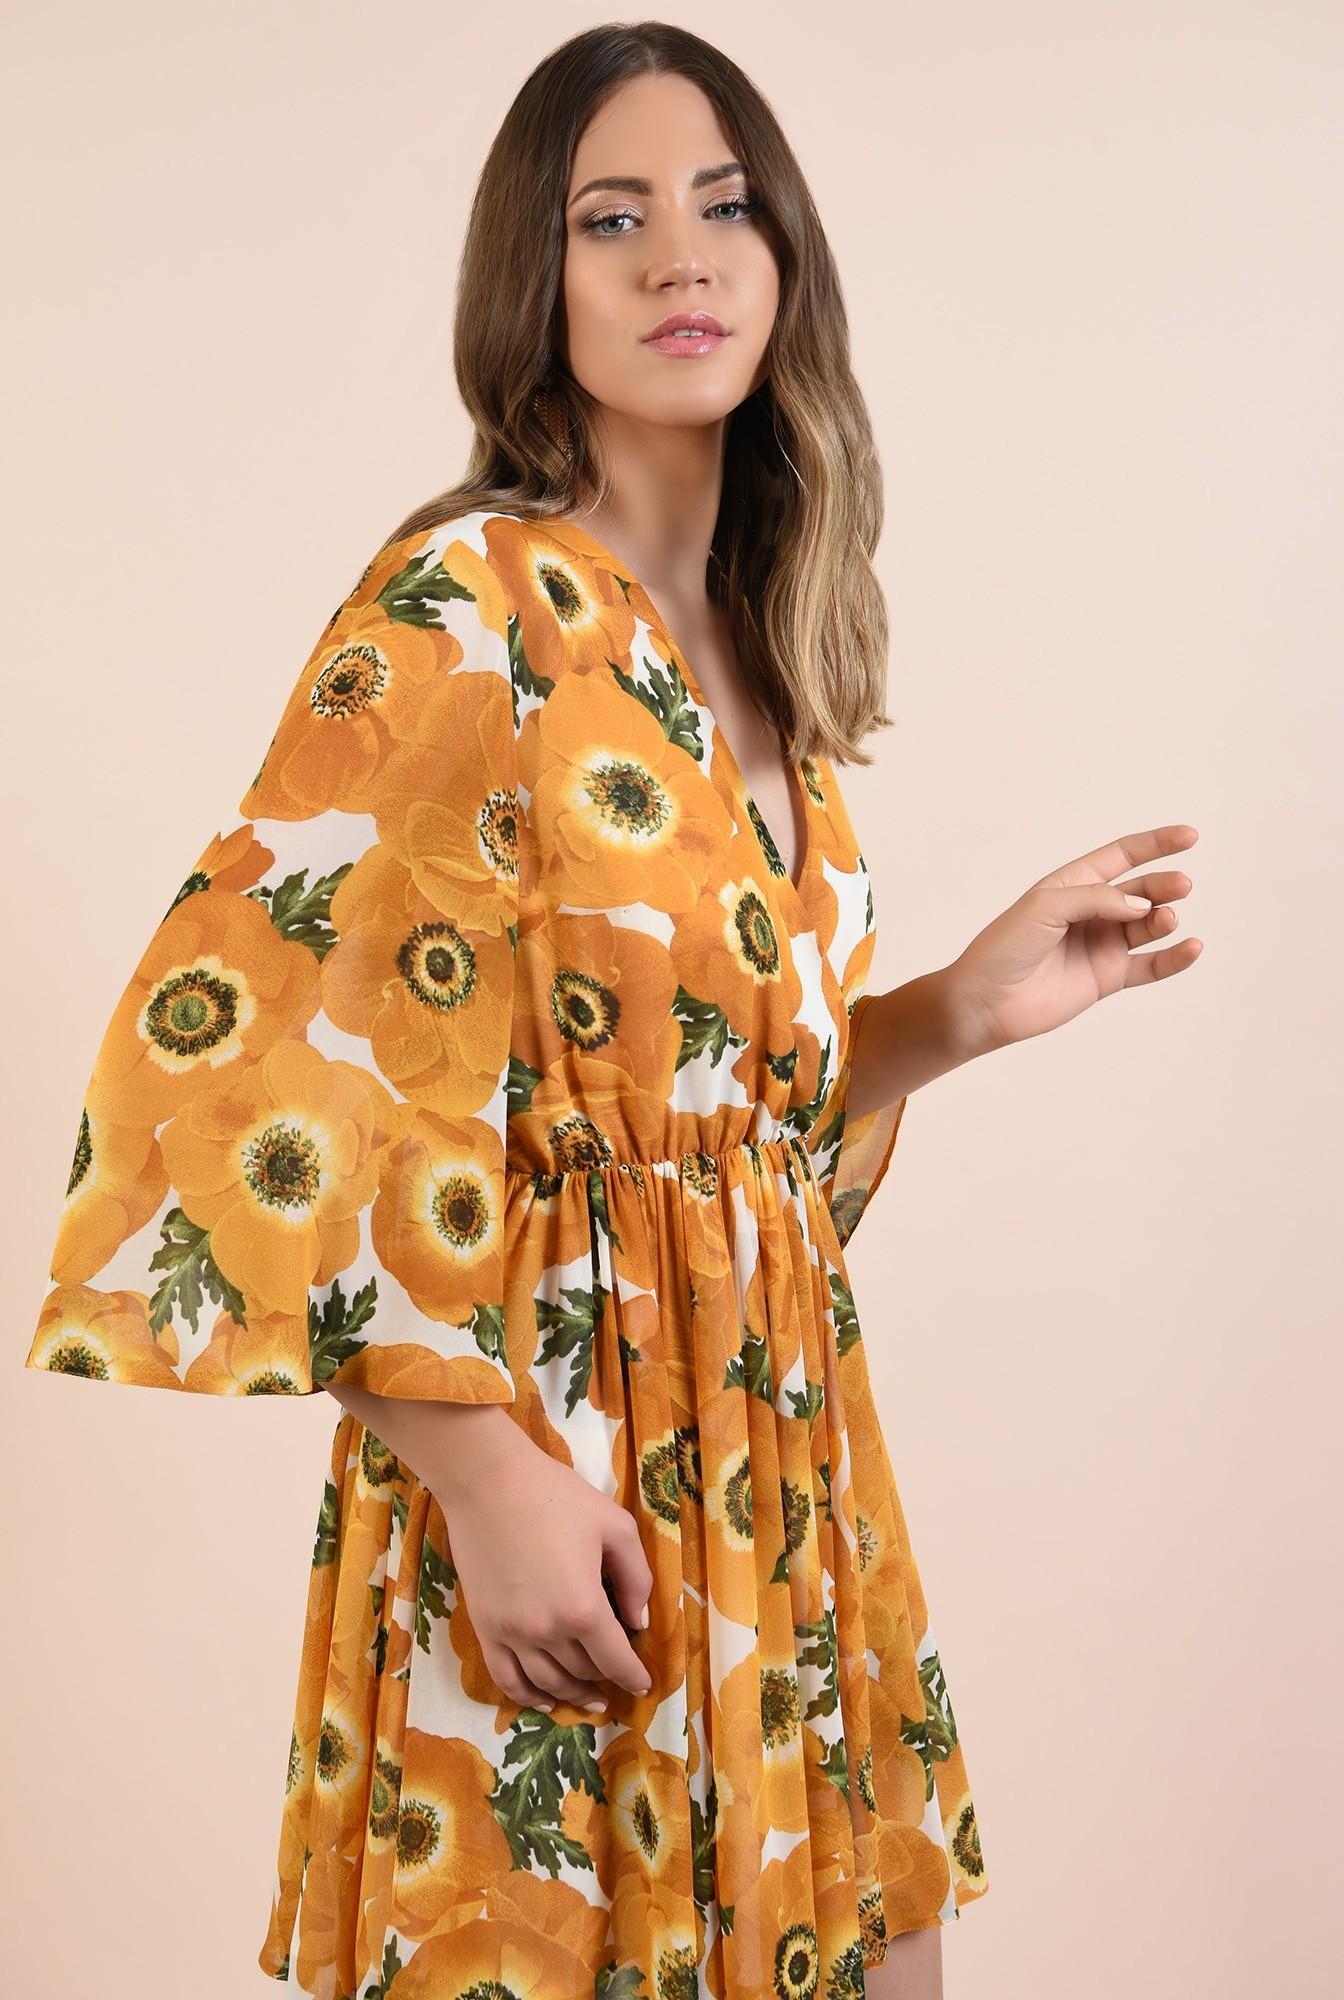 2 - 360 - rochie imprimata, casual, clos, talie pe elastic, motive florale